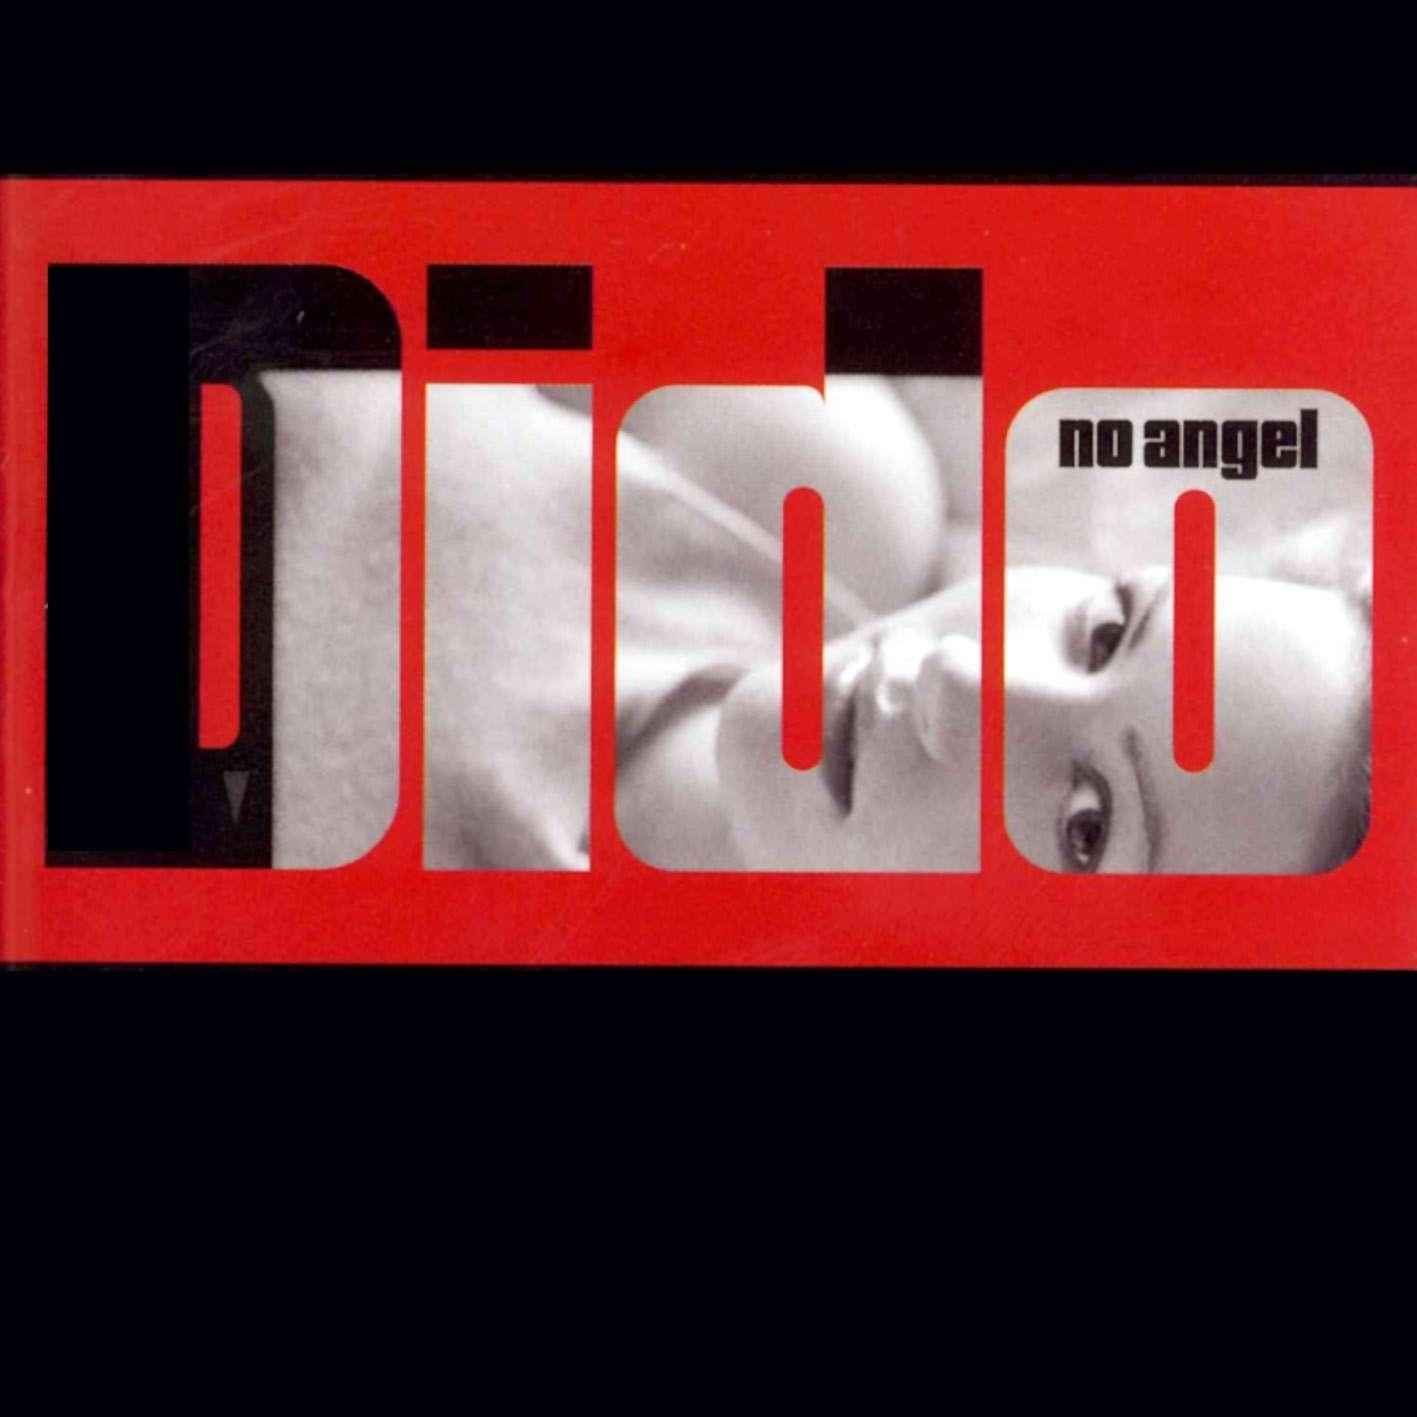 http://1.bp.blogspot.com/-PqWrA6c4yzk/TbbutTYkJSI/AAAAAAAAClo/Ygy8iyy4Hg8/s1600/Dido-No-Angel-Delantera.jpg